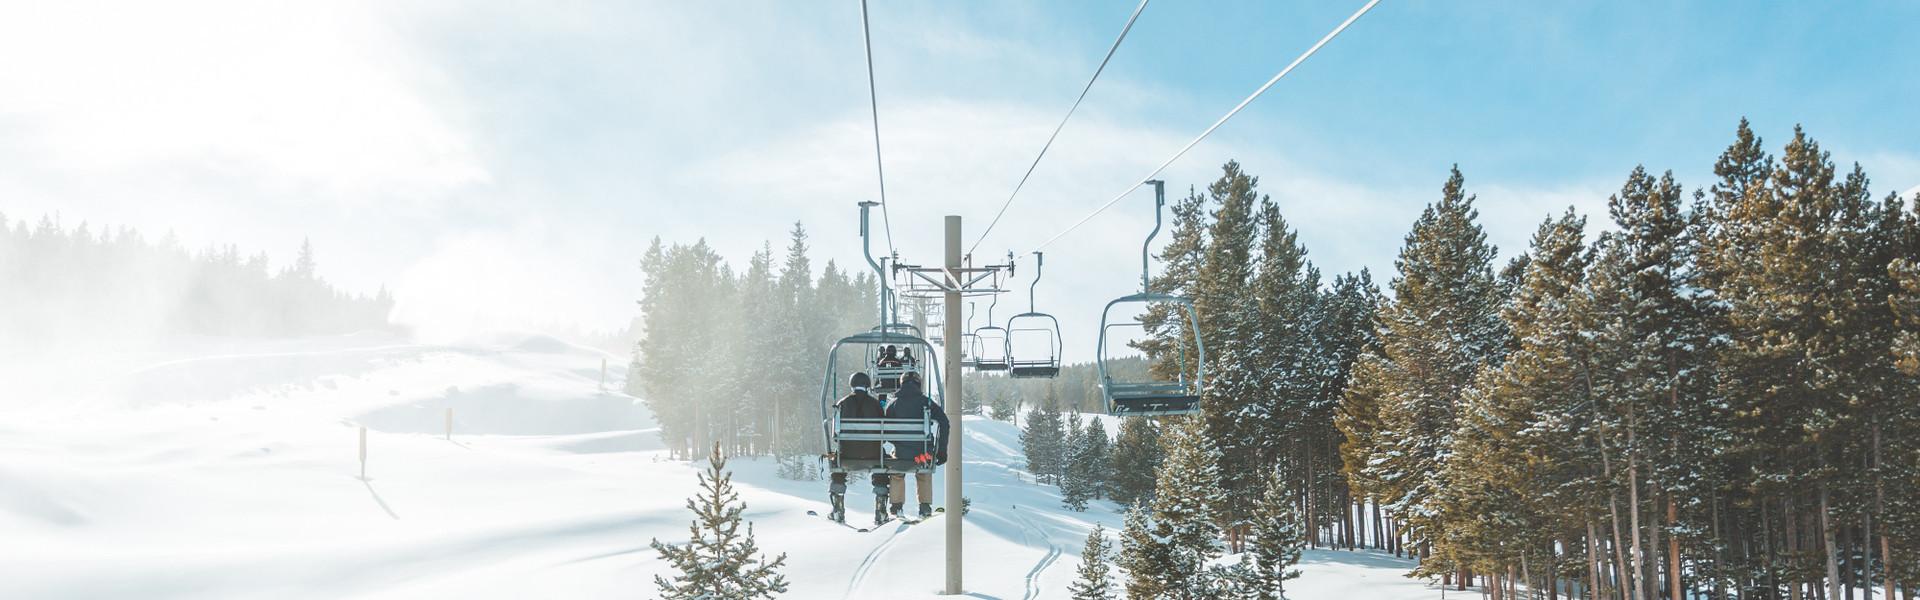 Best Things To Do In Park City Utah   Ski Lift